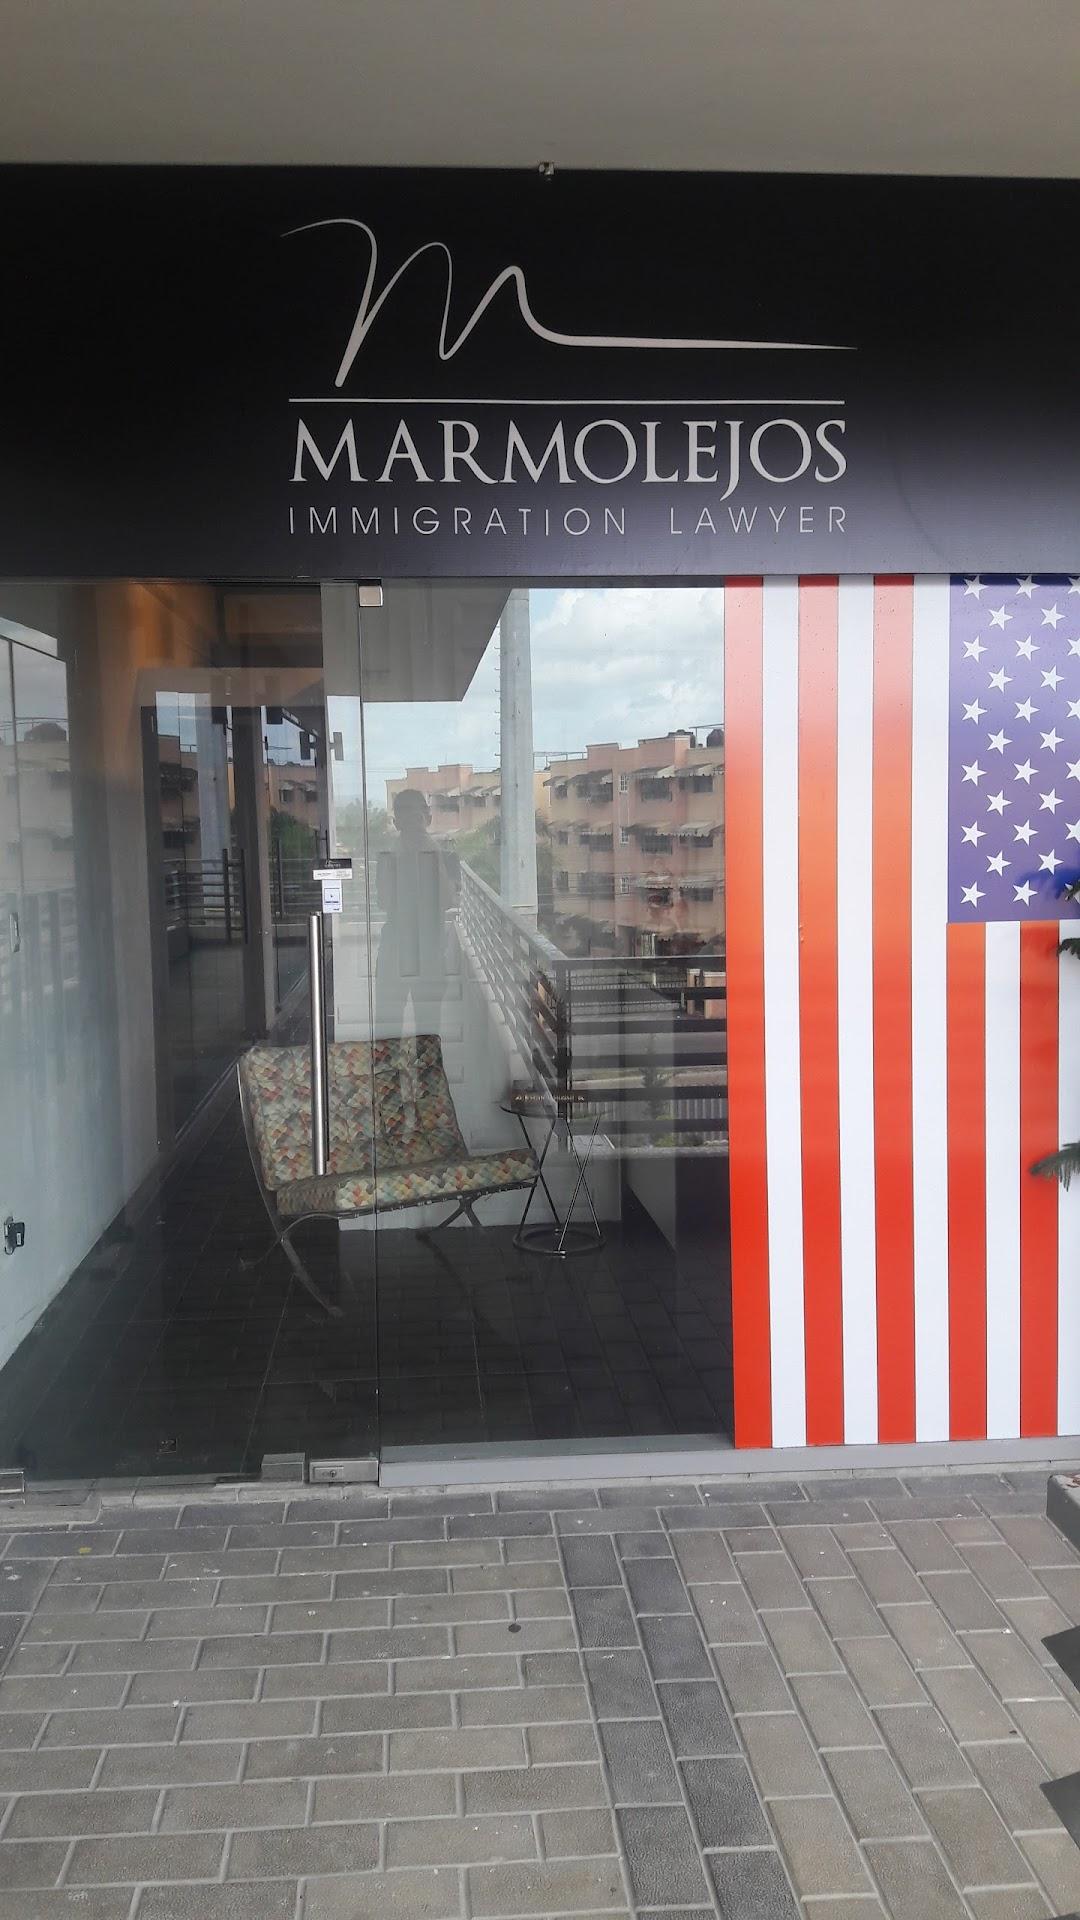 Marmolejos Immigration Lawyer